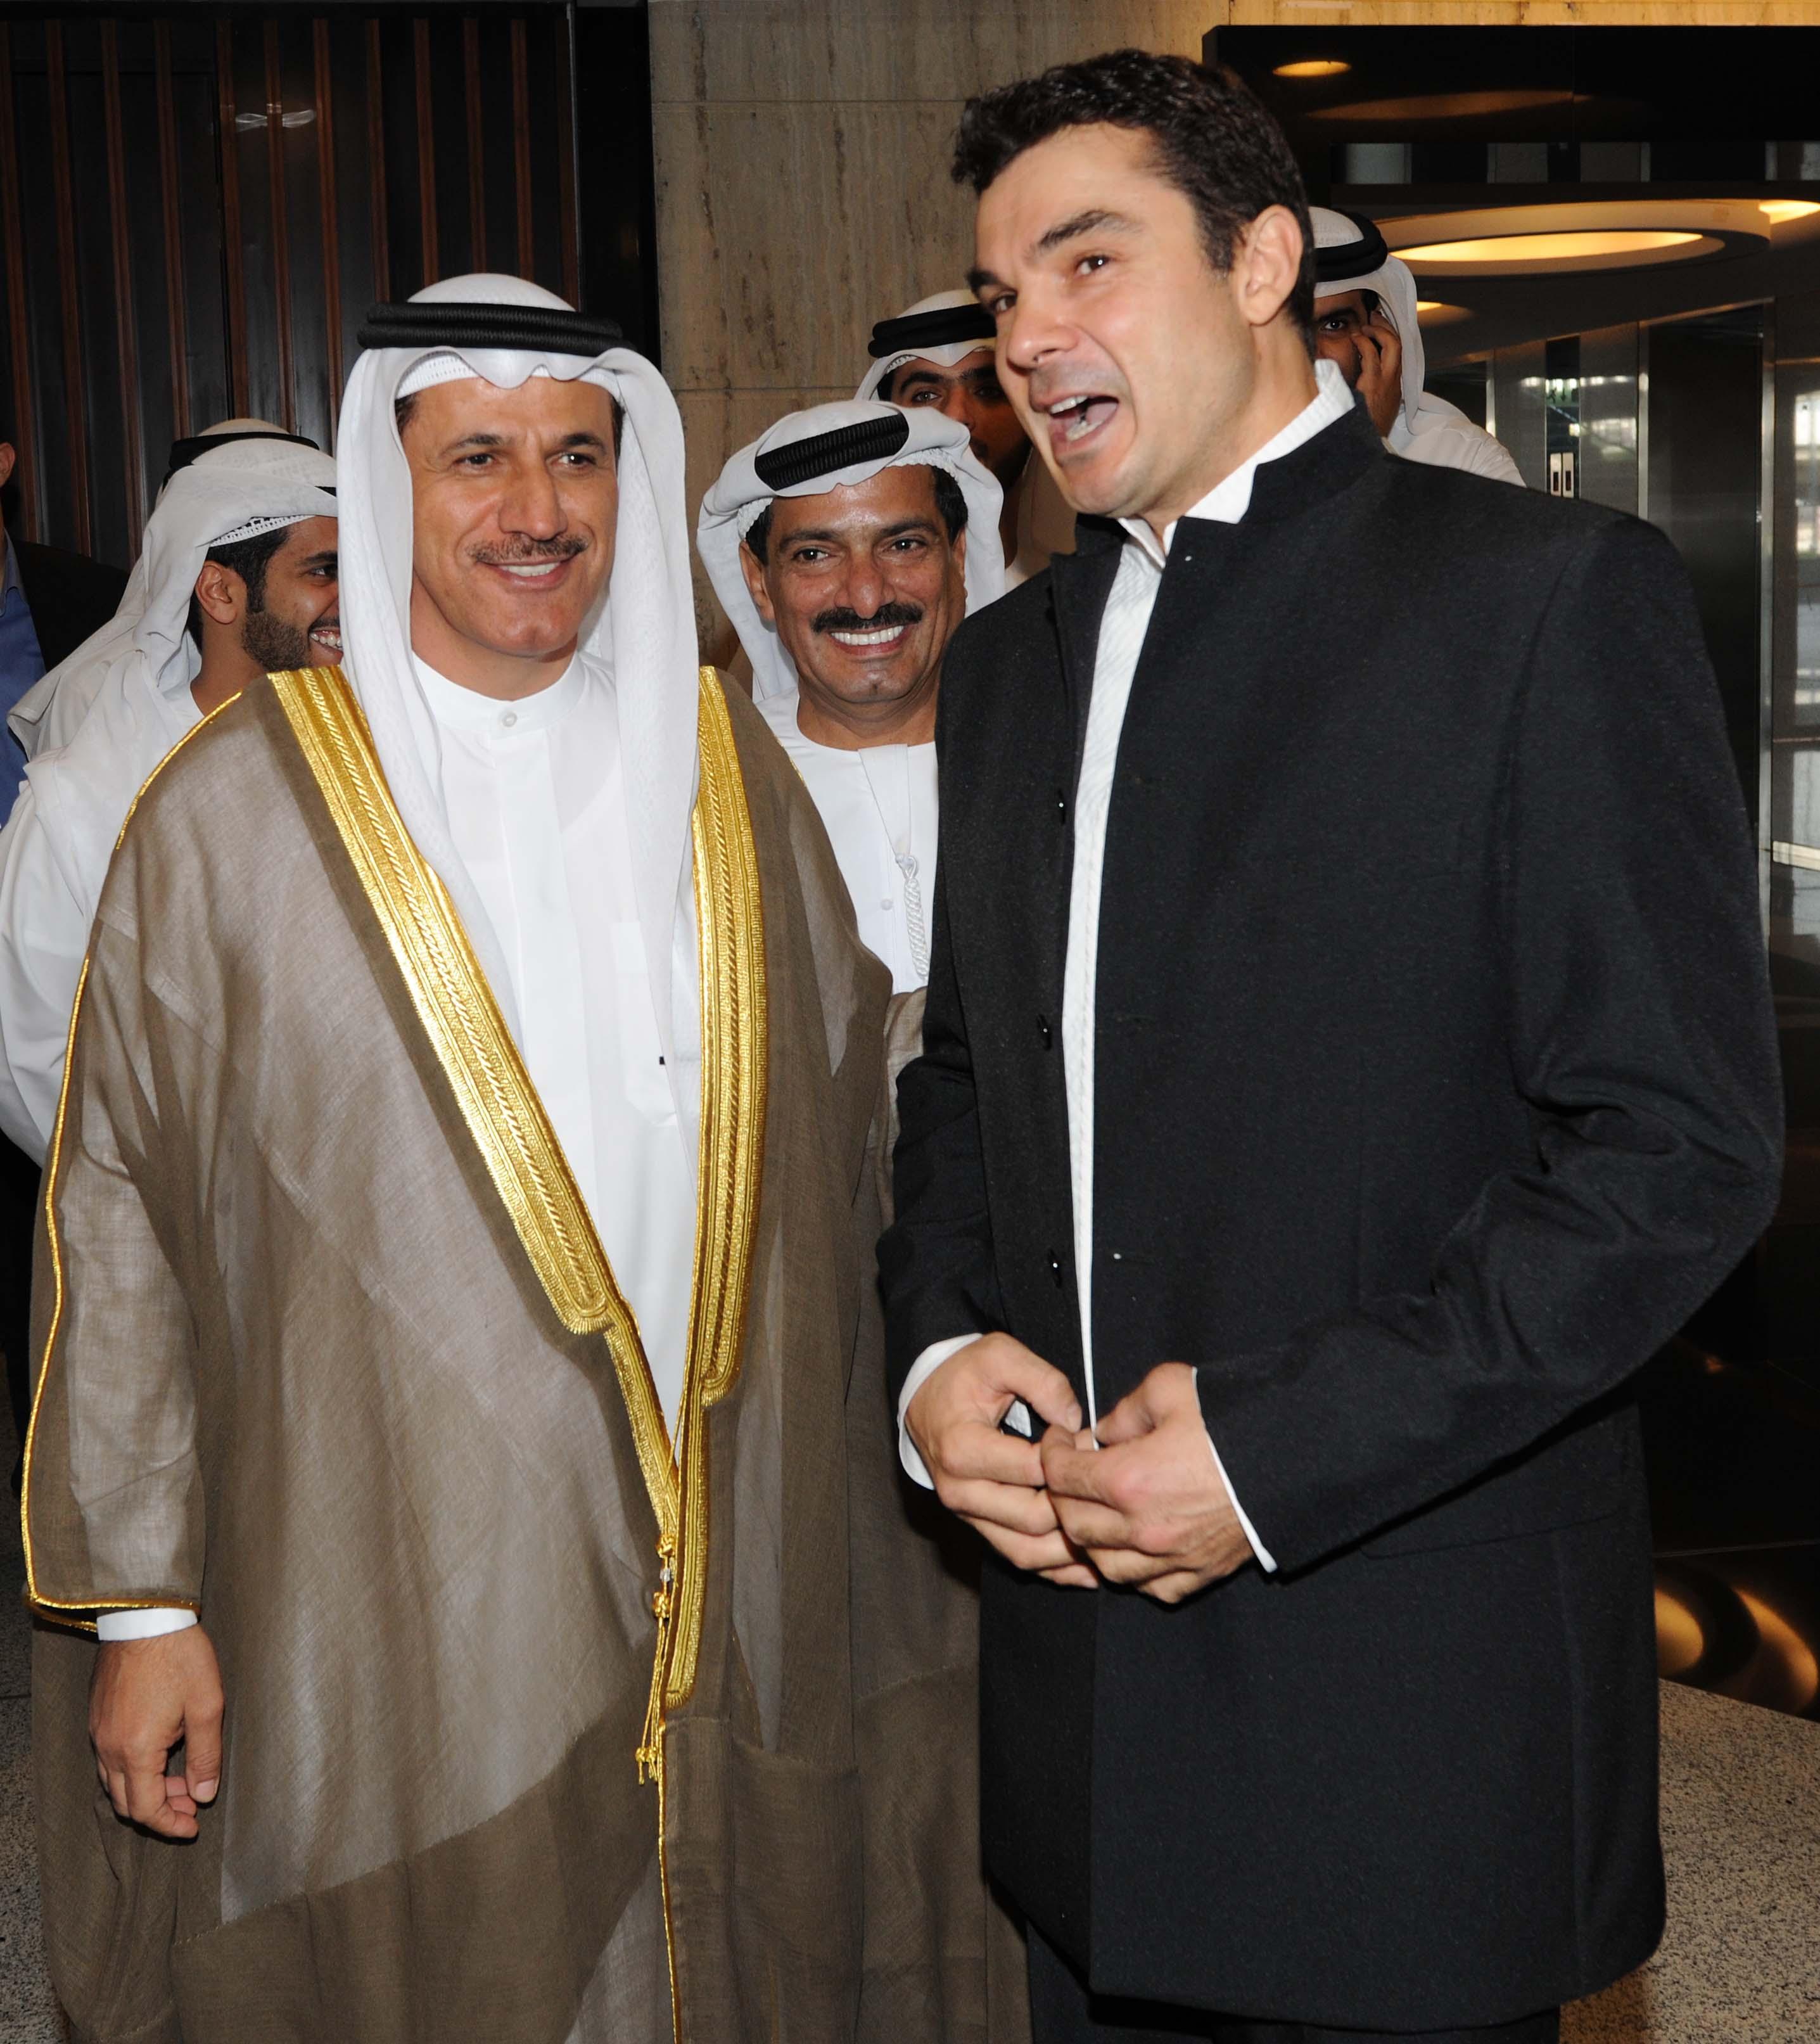 H.E Sultan Bin Saeed Al Mansoori